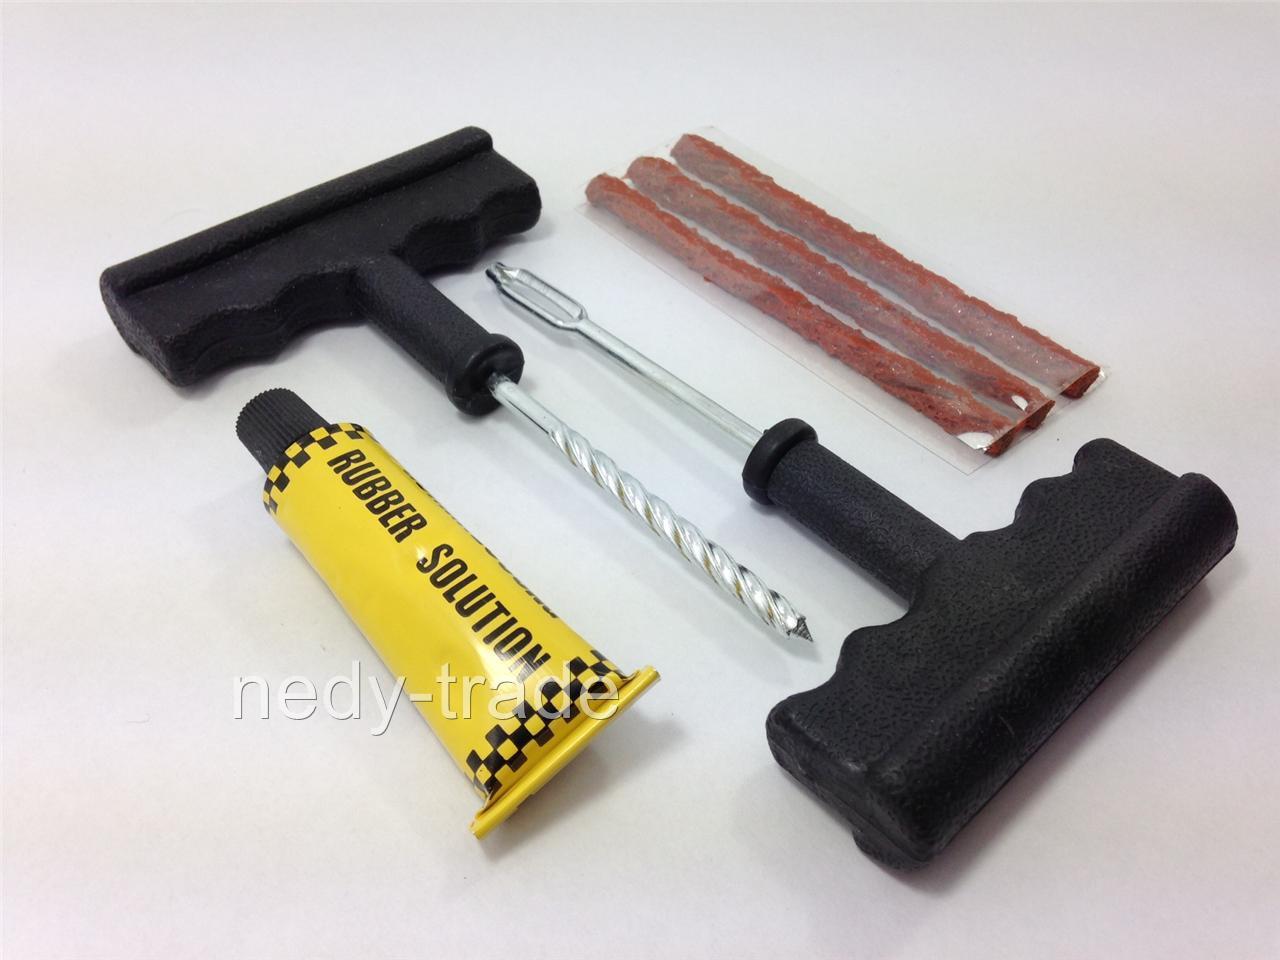 tubeless tire tyre puncture repair kit car van motorcycle. Black Bedroom Furniture Sets. Home Design Ideas